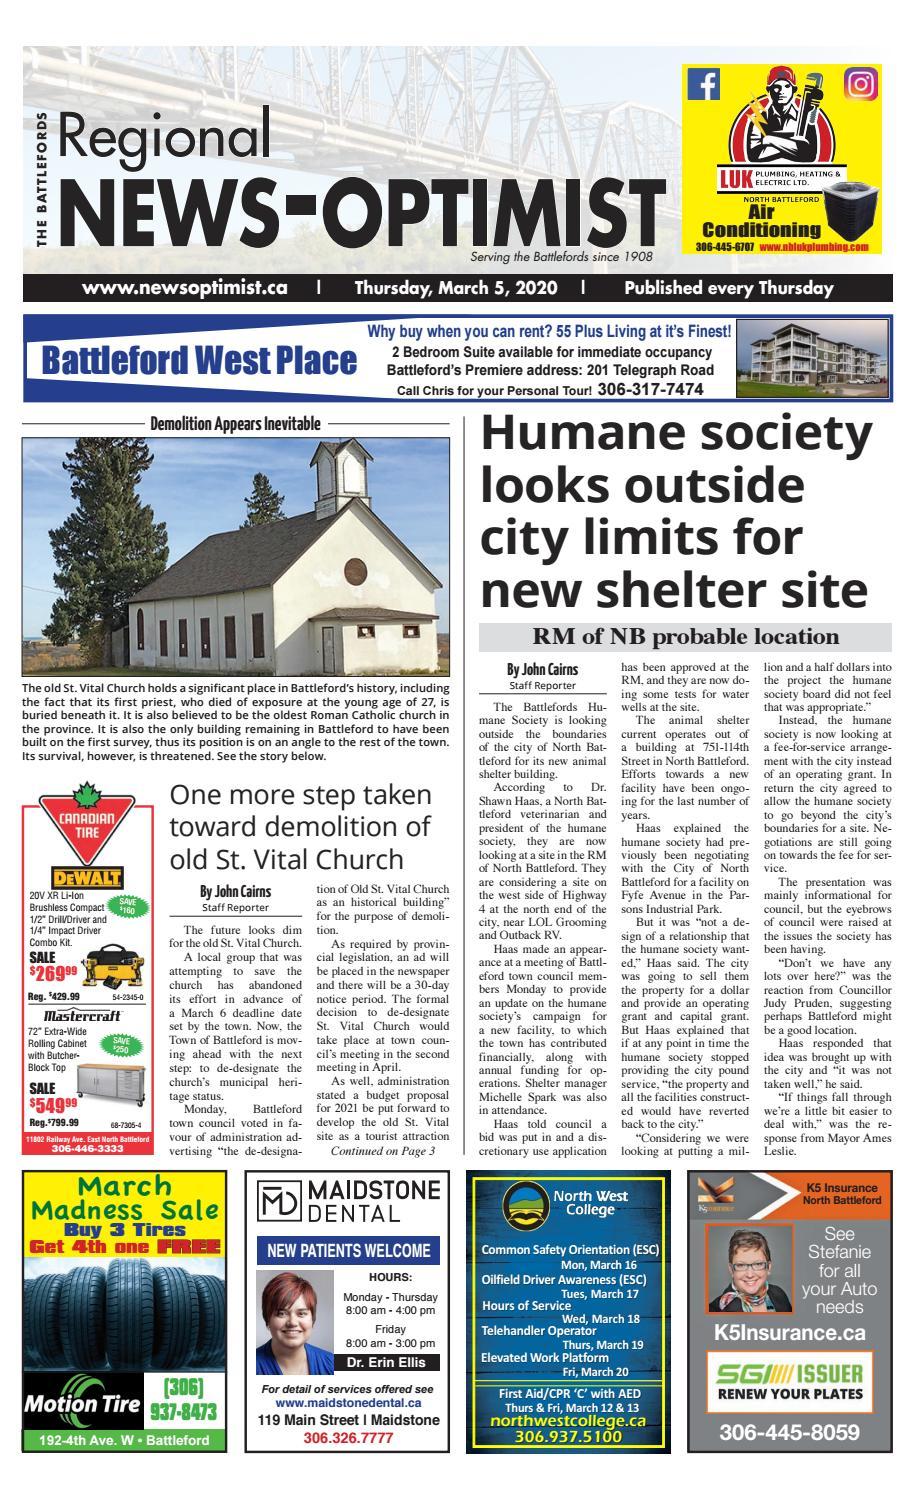 Regional News Optimist March 5 2020 By Battlefords News Optimist